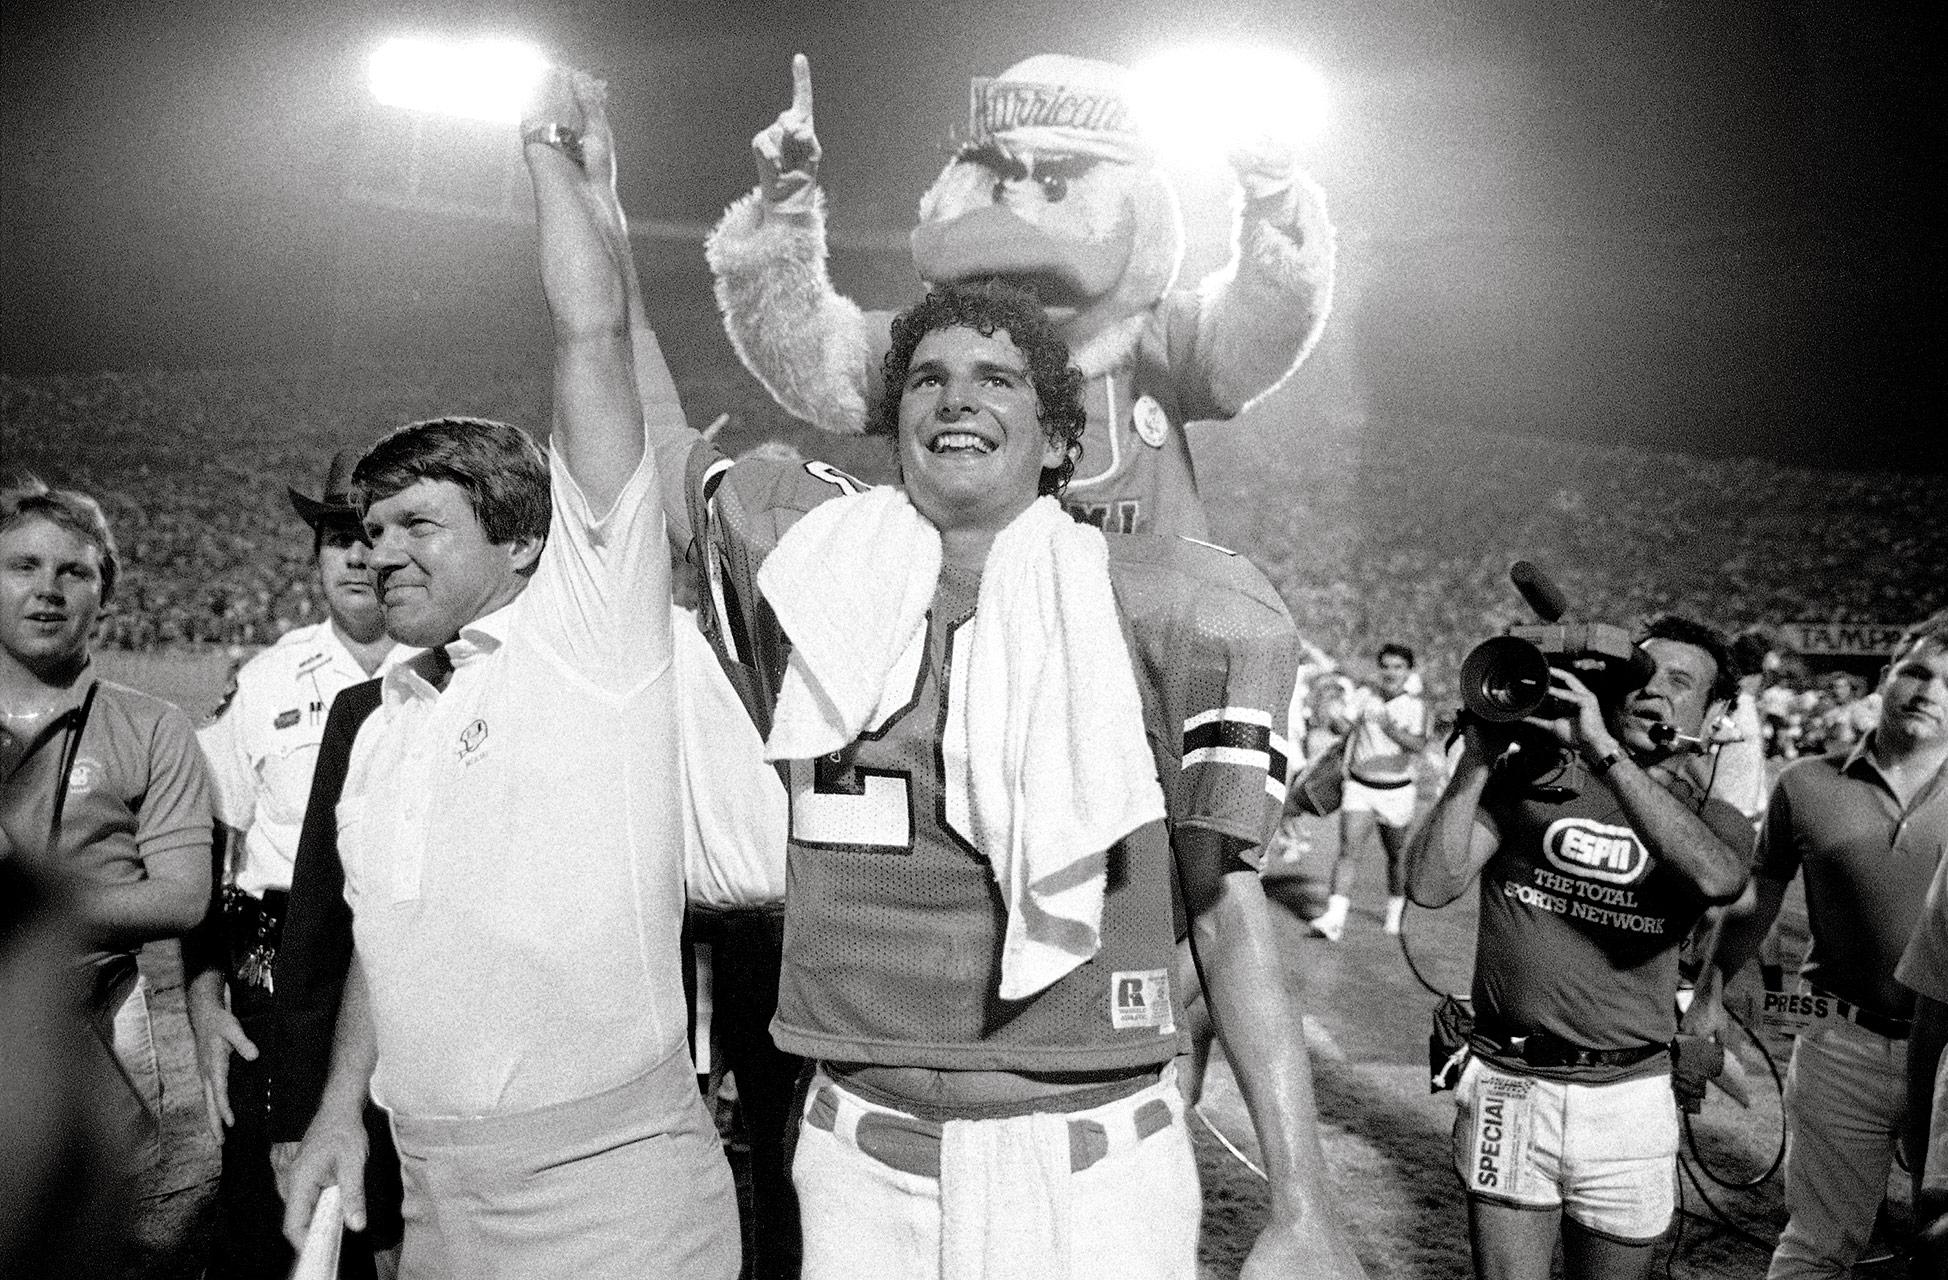 Tampa, Fla.: Sept. 1, 1984